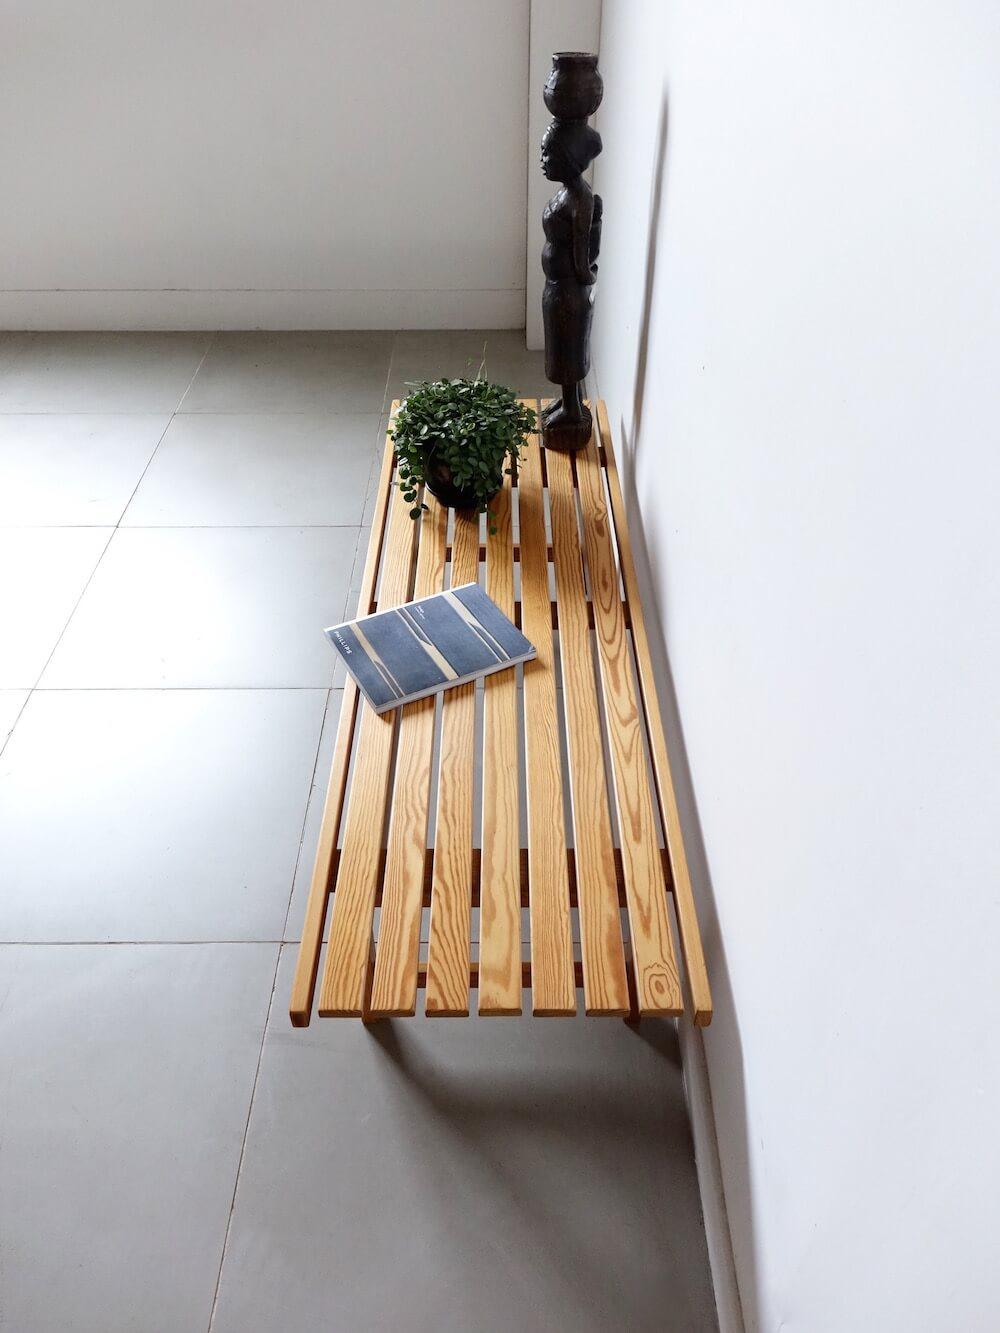 Slat Bench Table by Hugo Svensson for Bjärnums Möbelfabriker